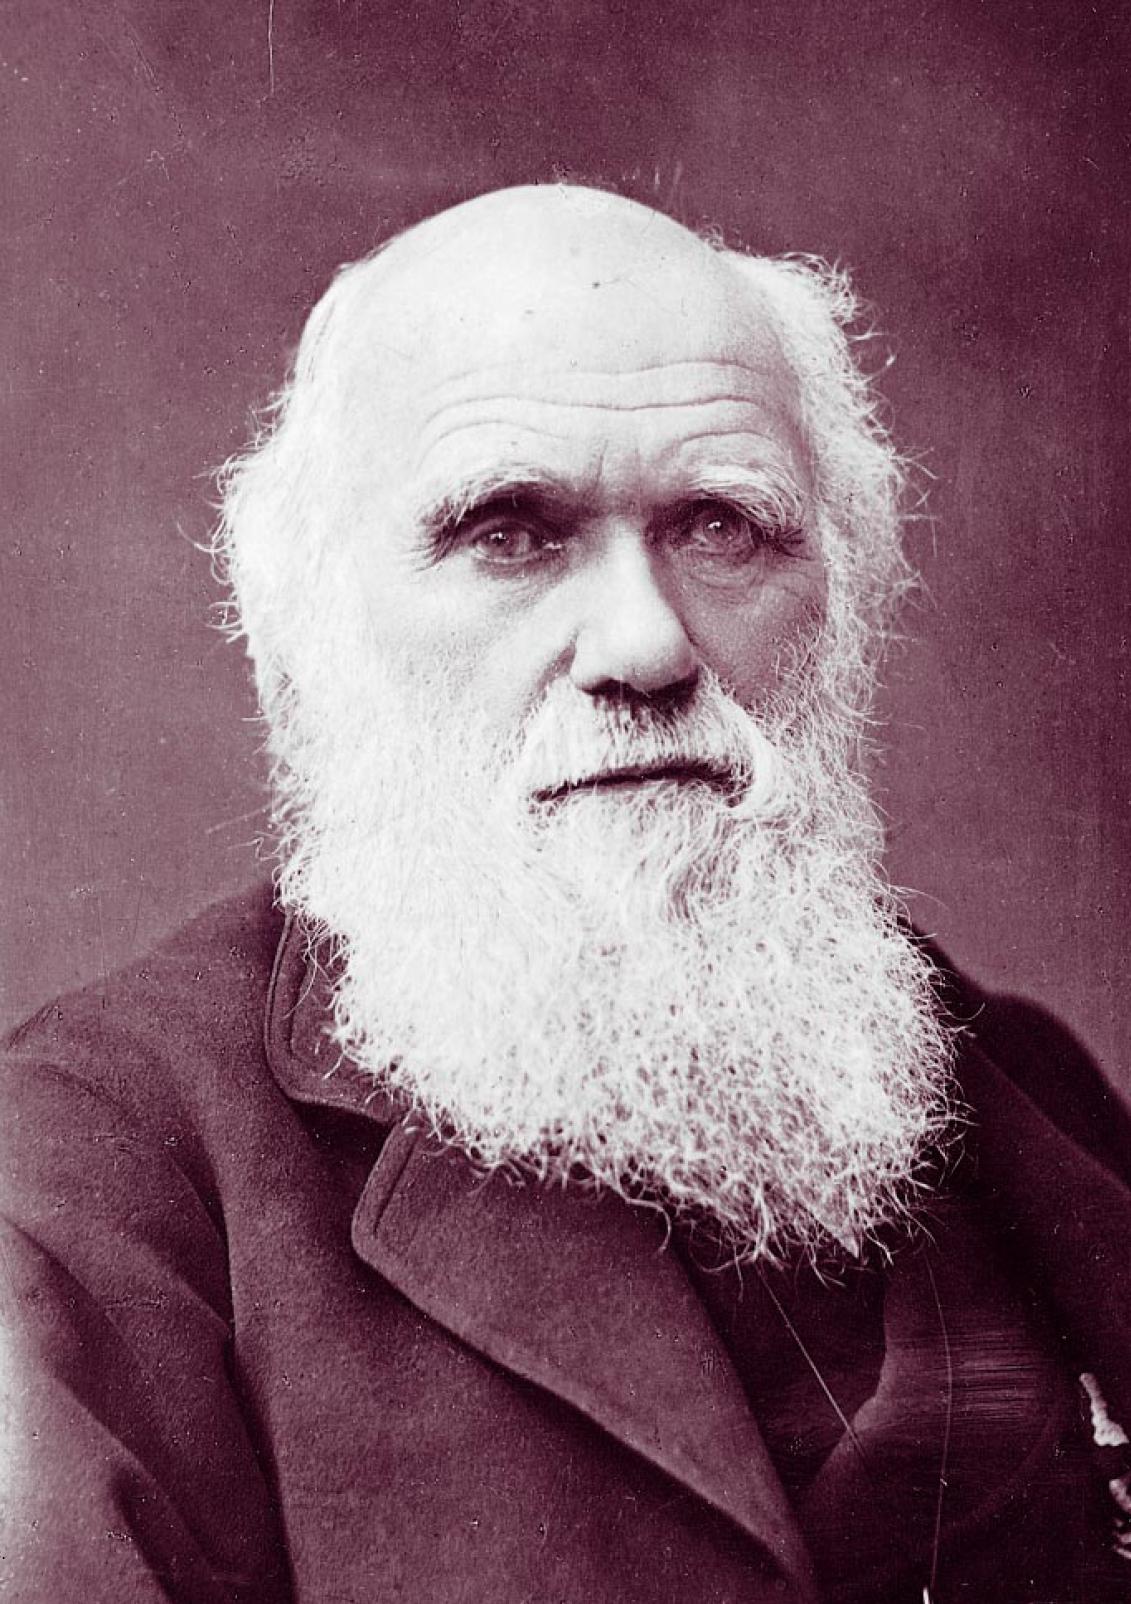 darwinism